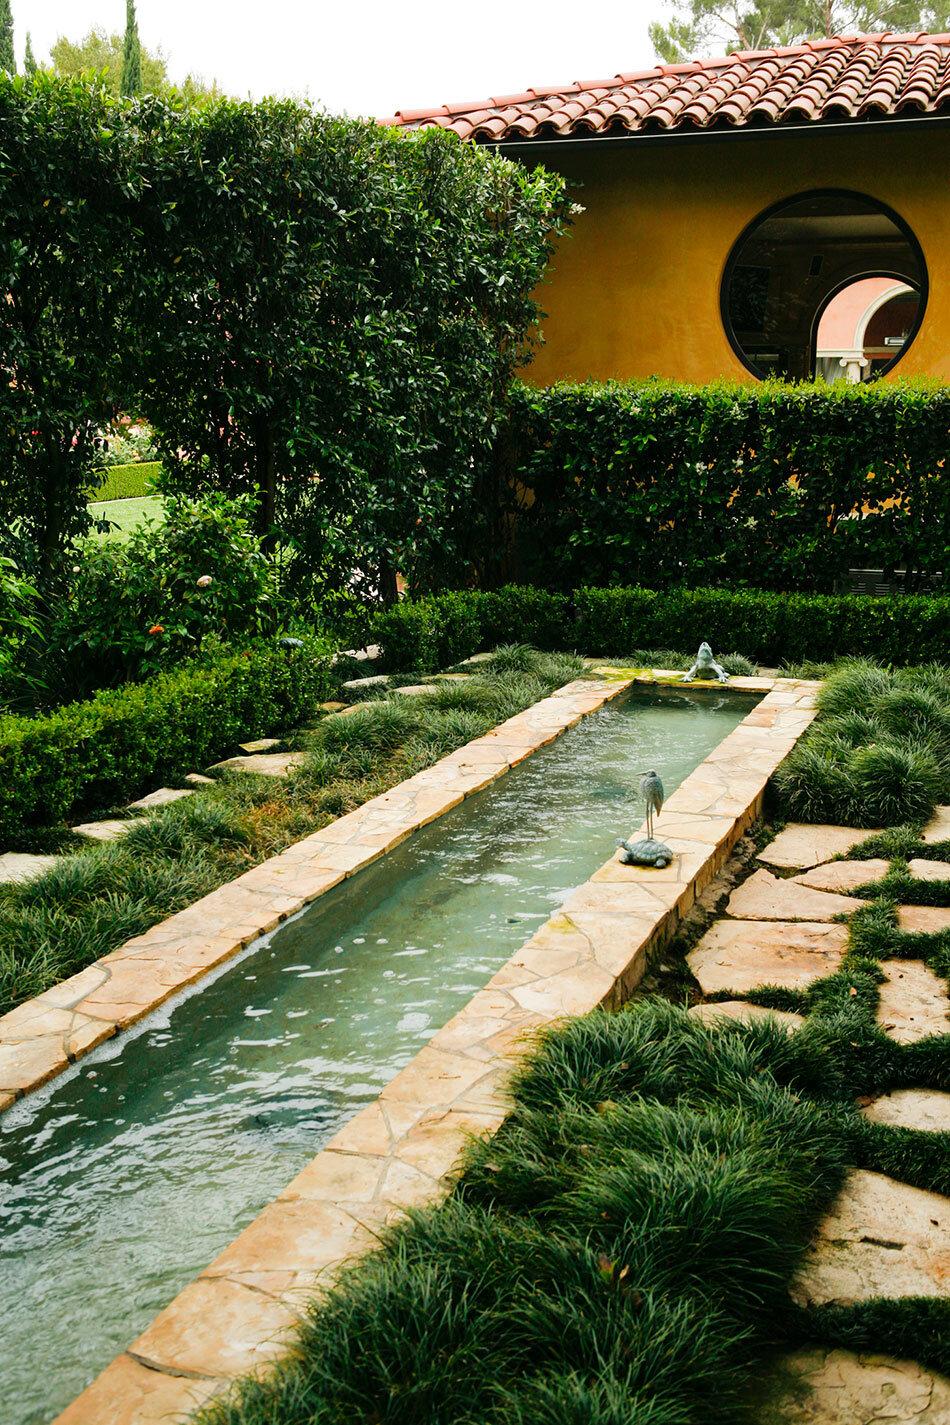 A beautiful Italian style garden by EPT Design